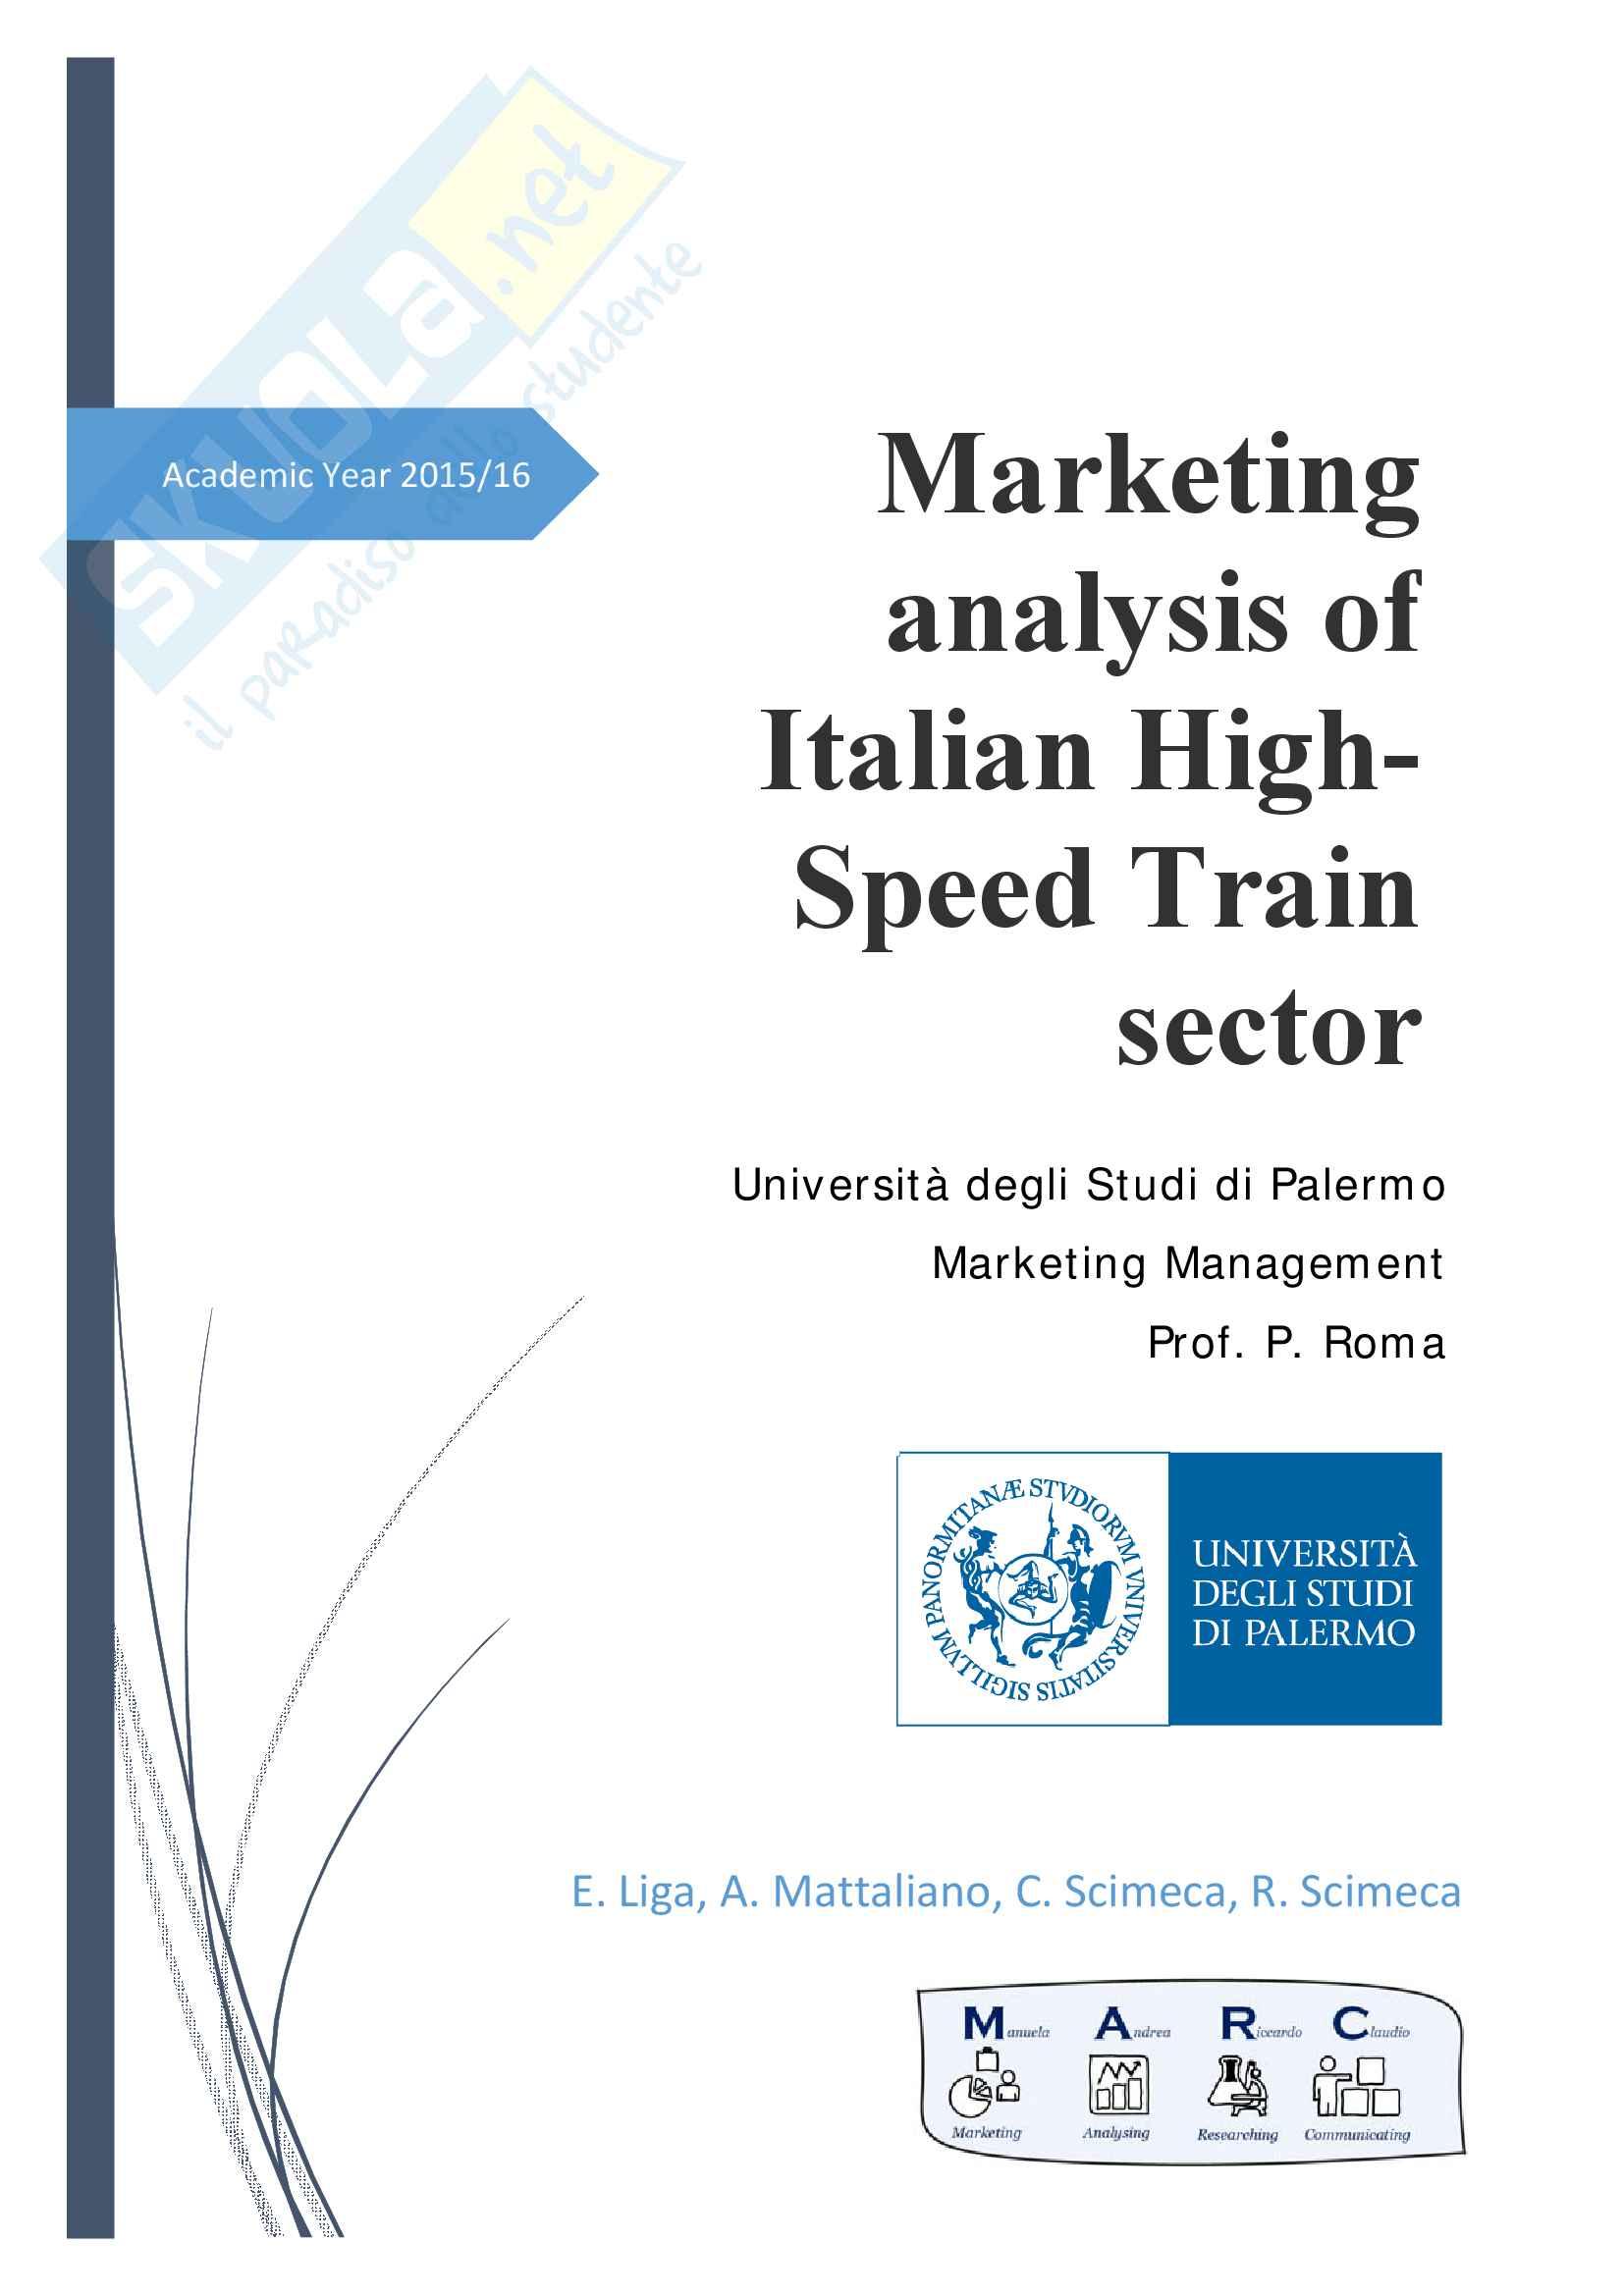 Marketing analysis of Italian HighSpeed Train sector